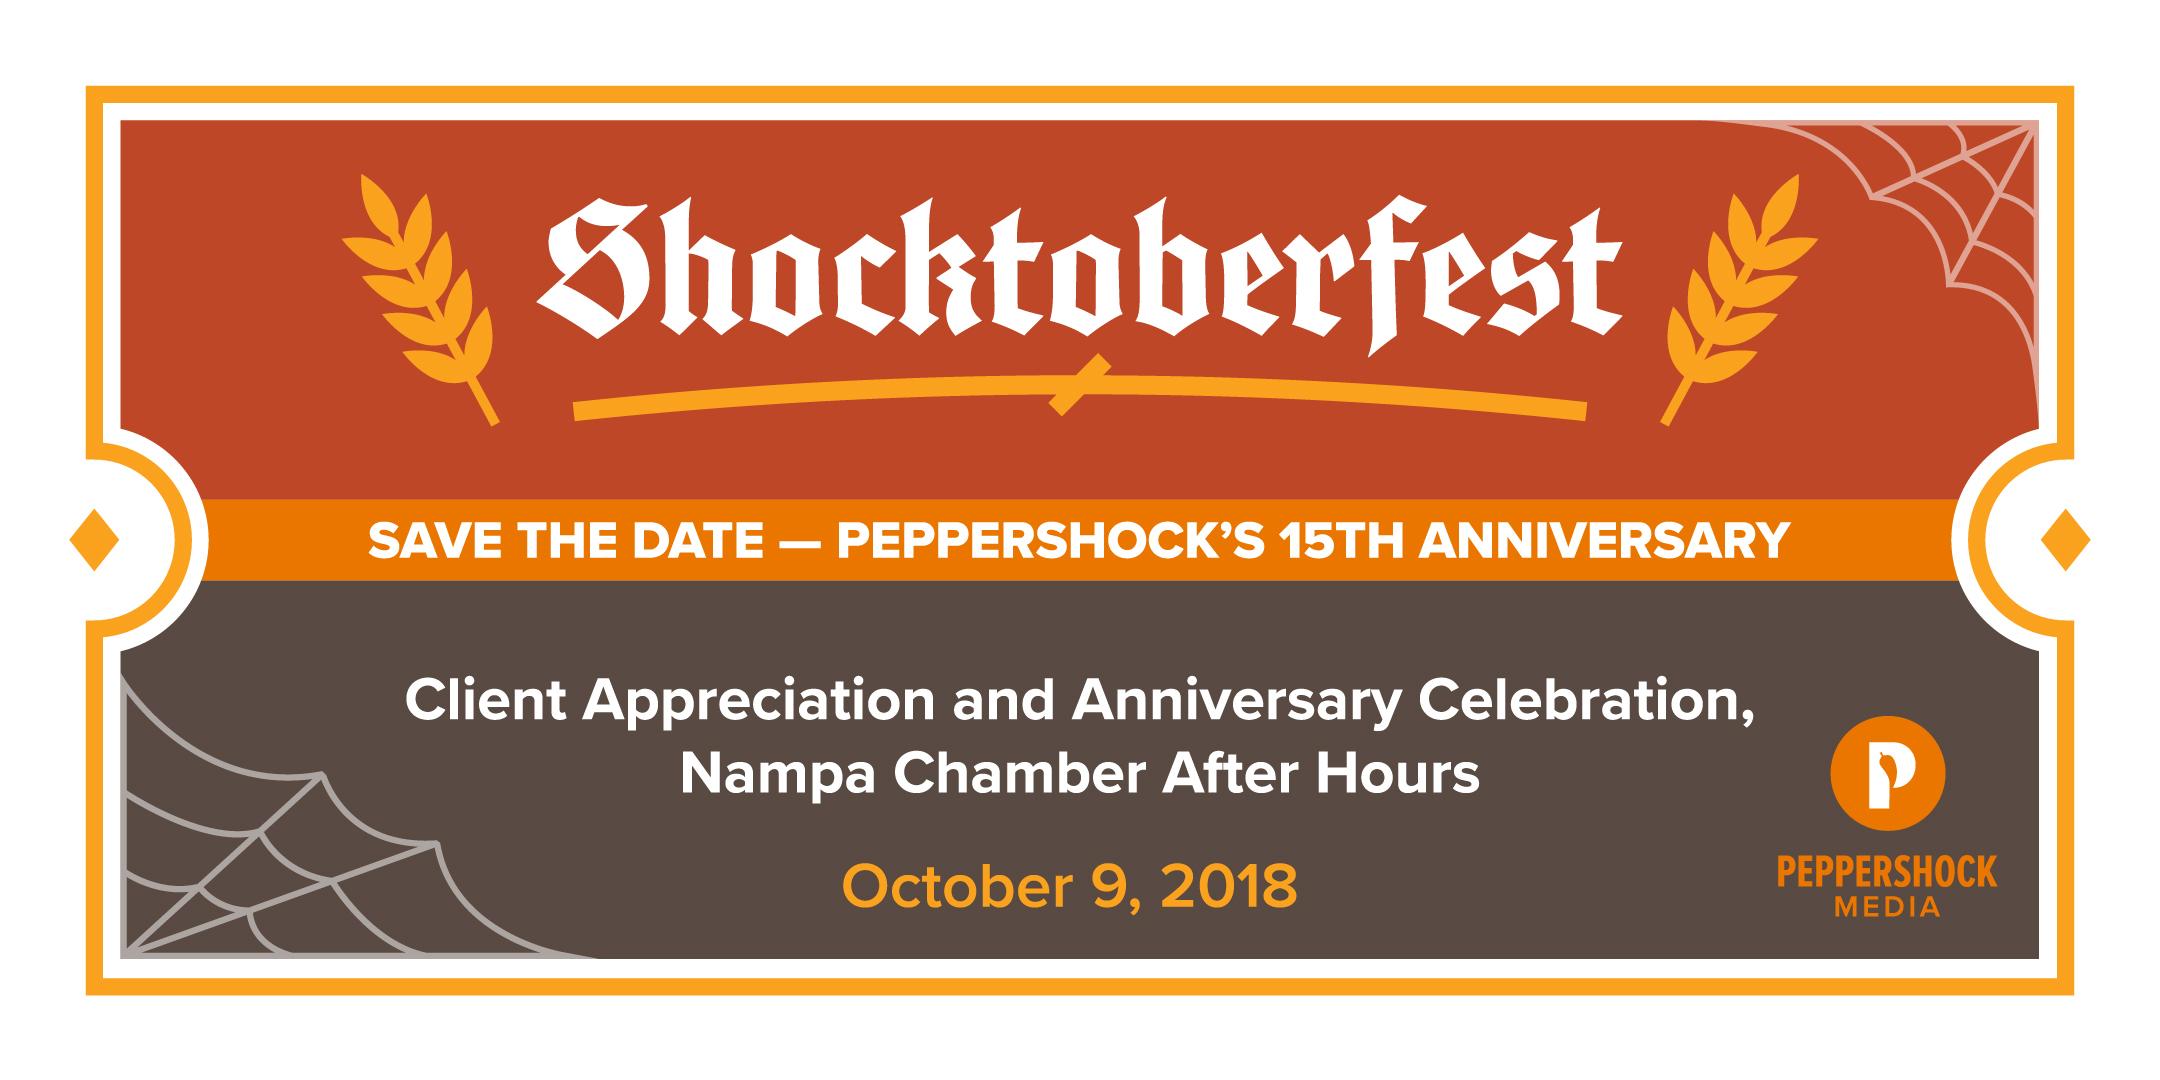 Peppershock Media_Shocktoberfest_Rhea Allen_Drew Allen